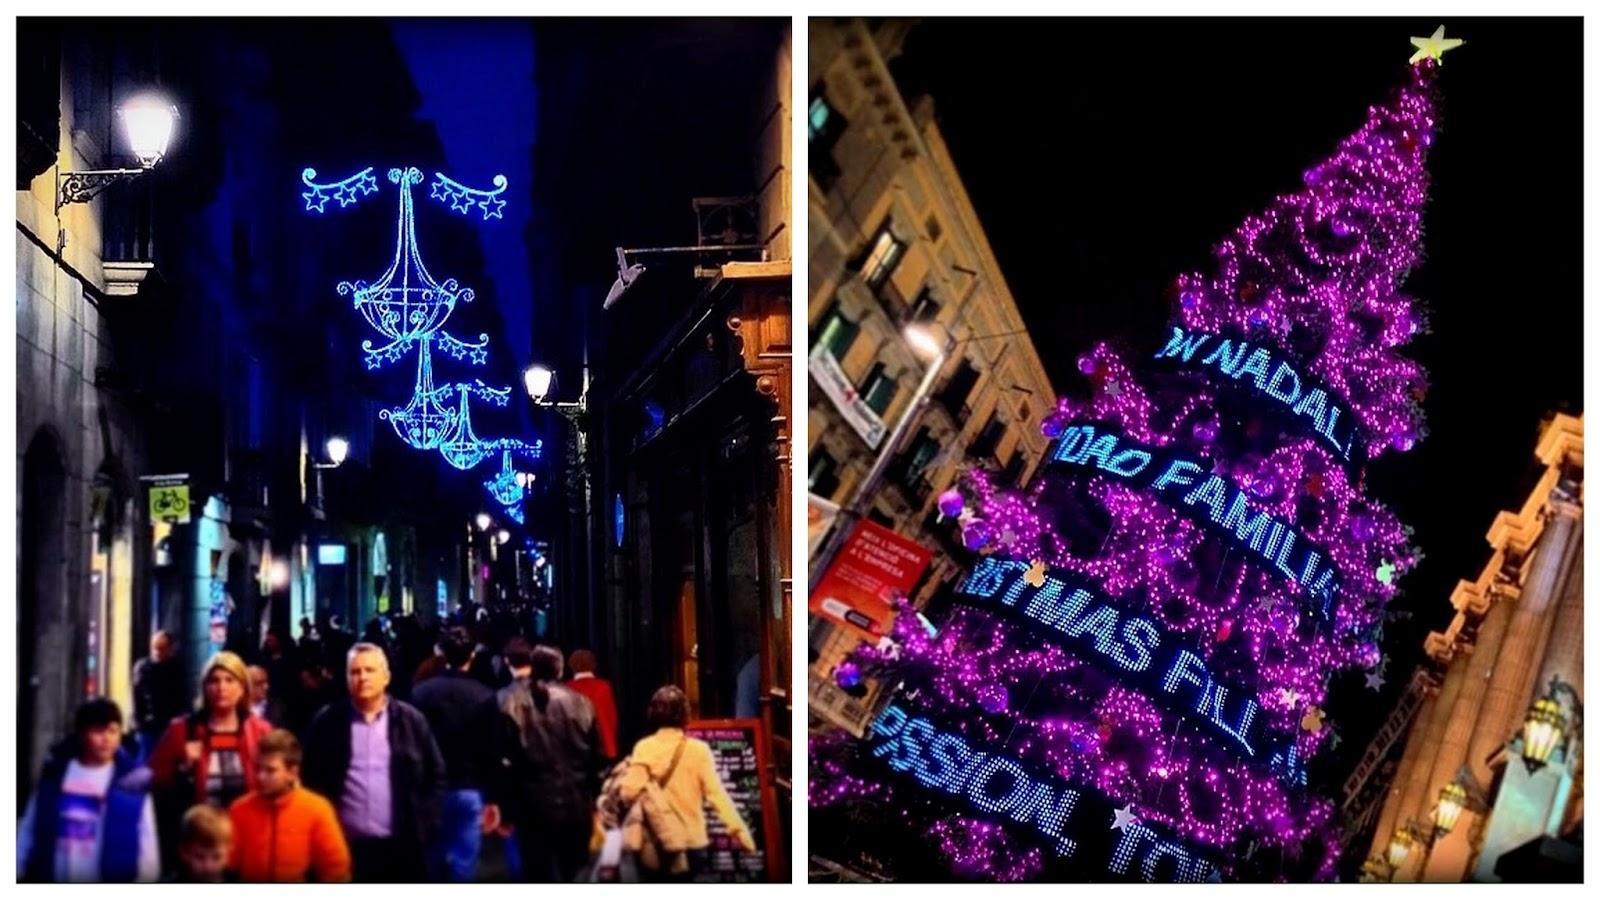 luces árbol navidad barcelona magia família christmas paseo portal àngel tallers noche mágica bcn